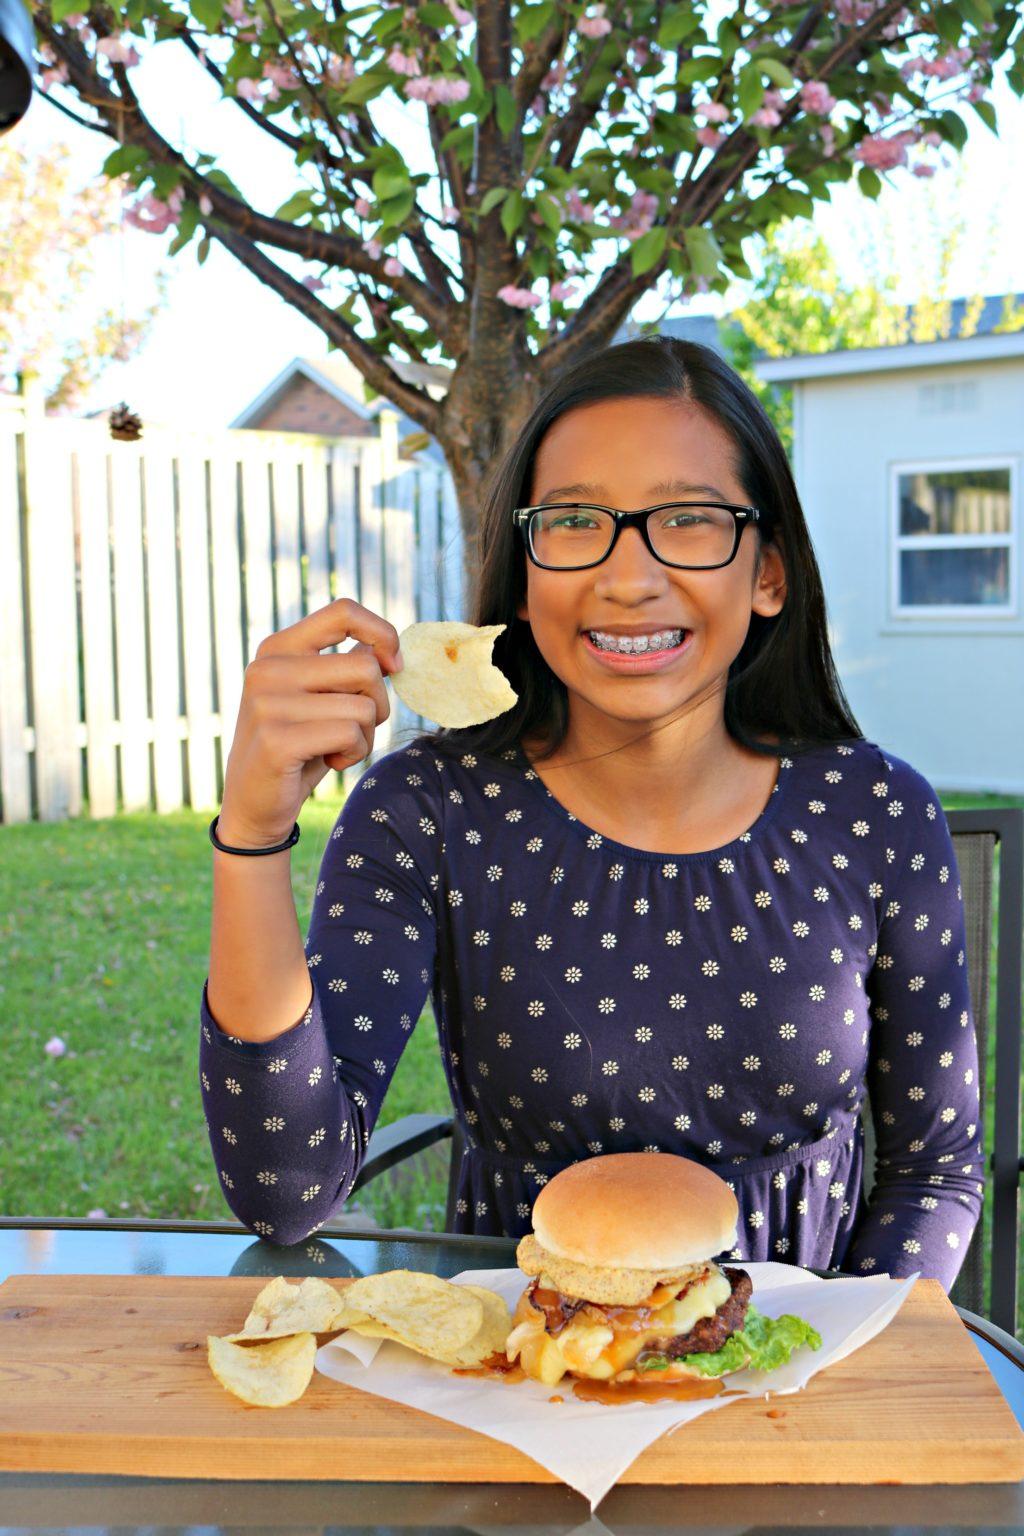 Gabby eats a potato chip while she enjoys the Maple Bacon Poutine burger. She smiles.